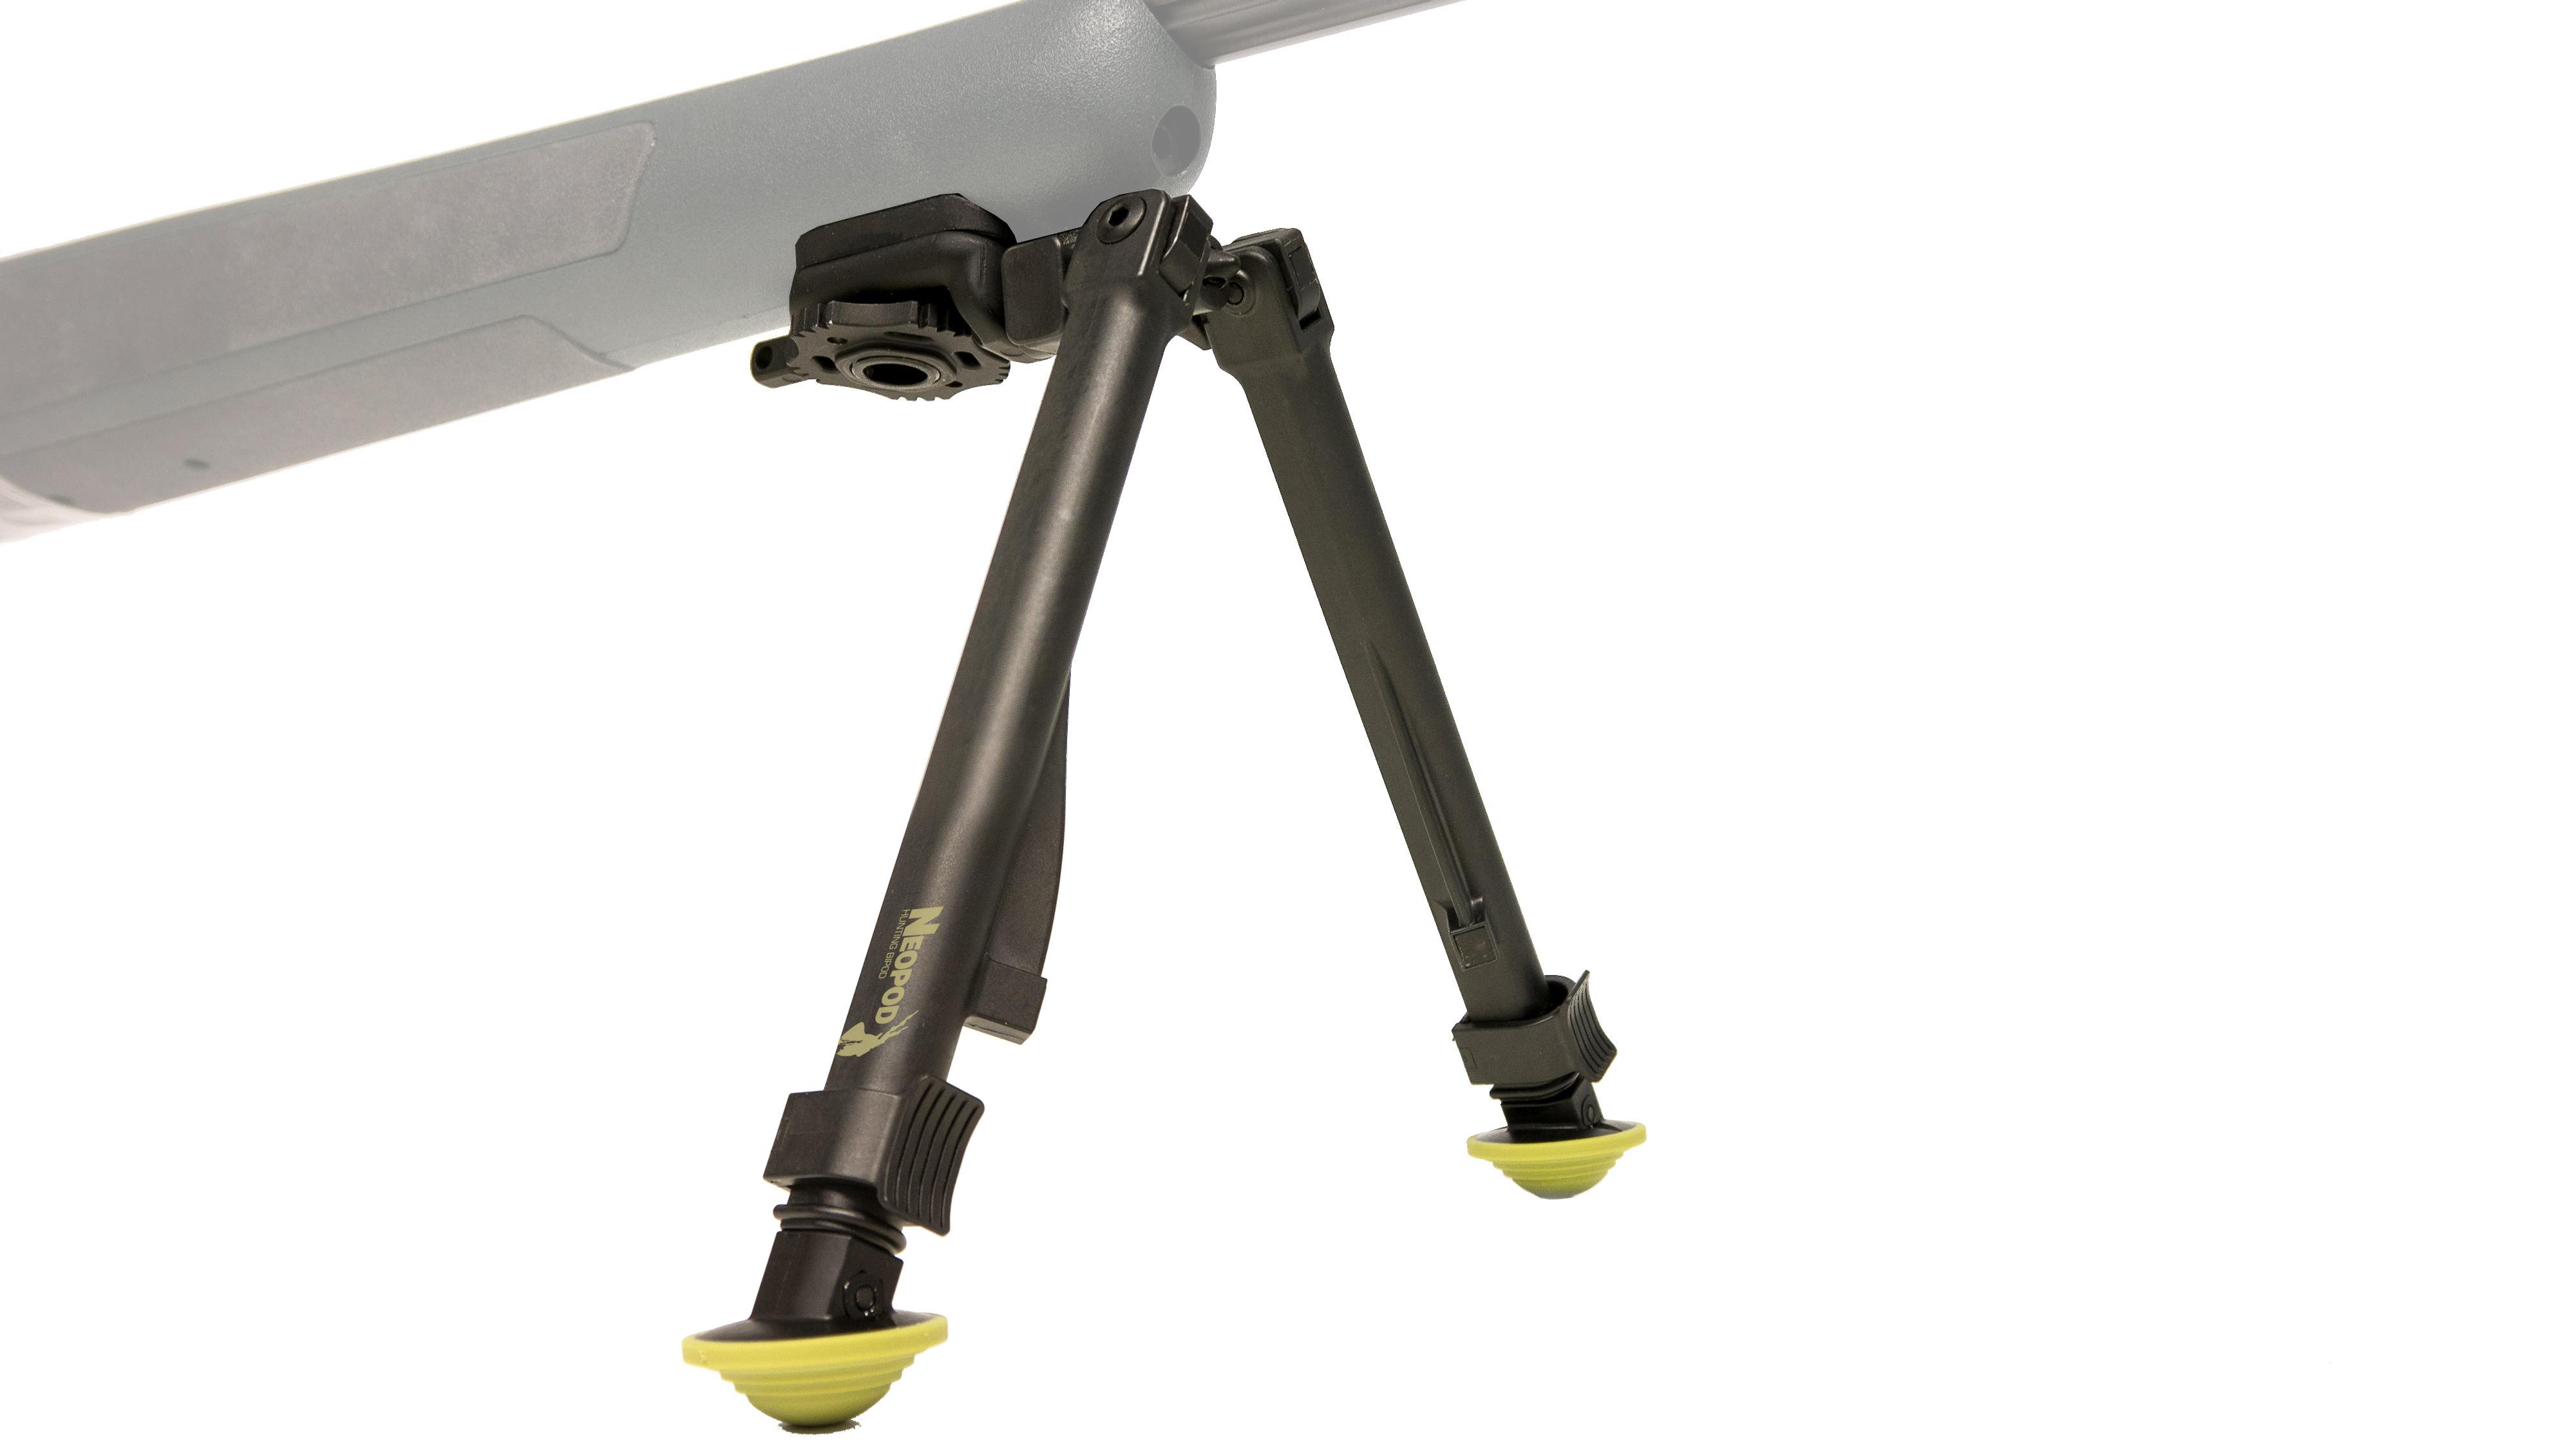 neopod-ultralight-bipod-sling-stud-adapter-deployed.jpg